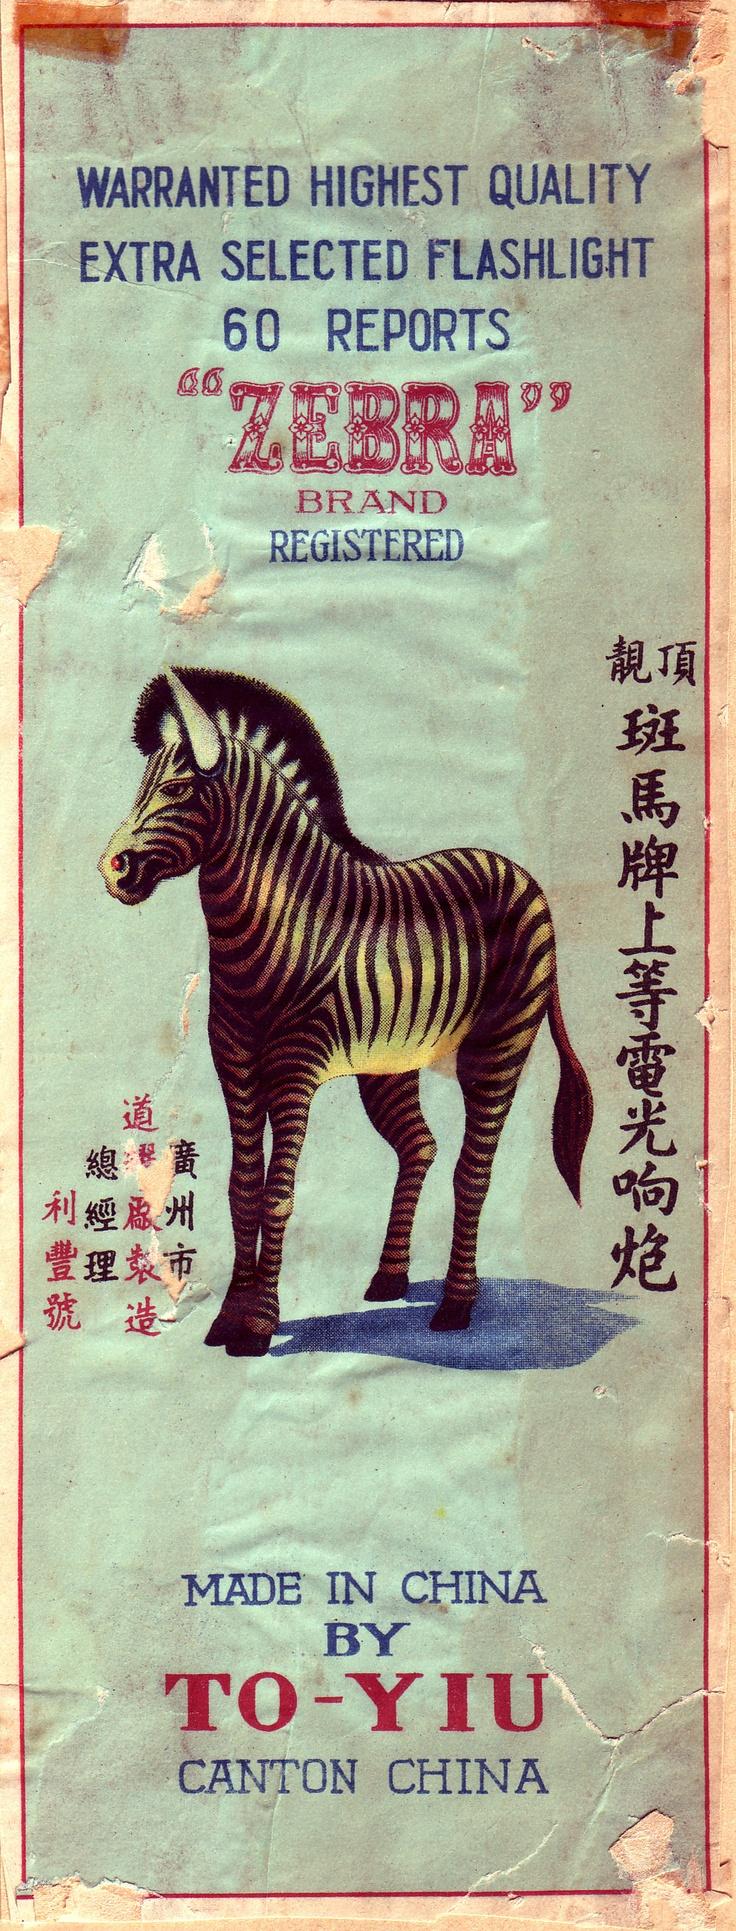 Black Cat Fireworks Zebra Brand Label